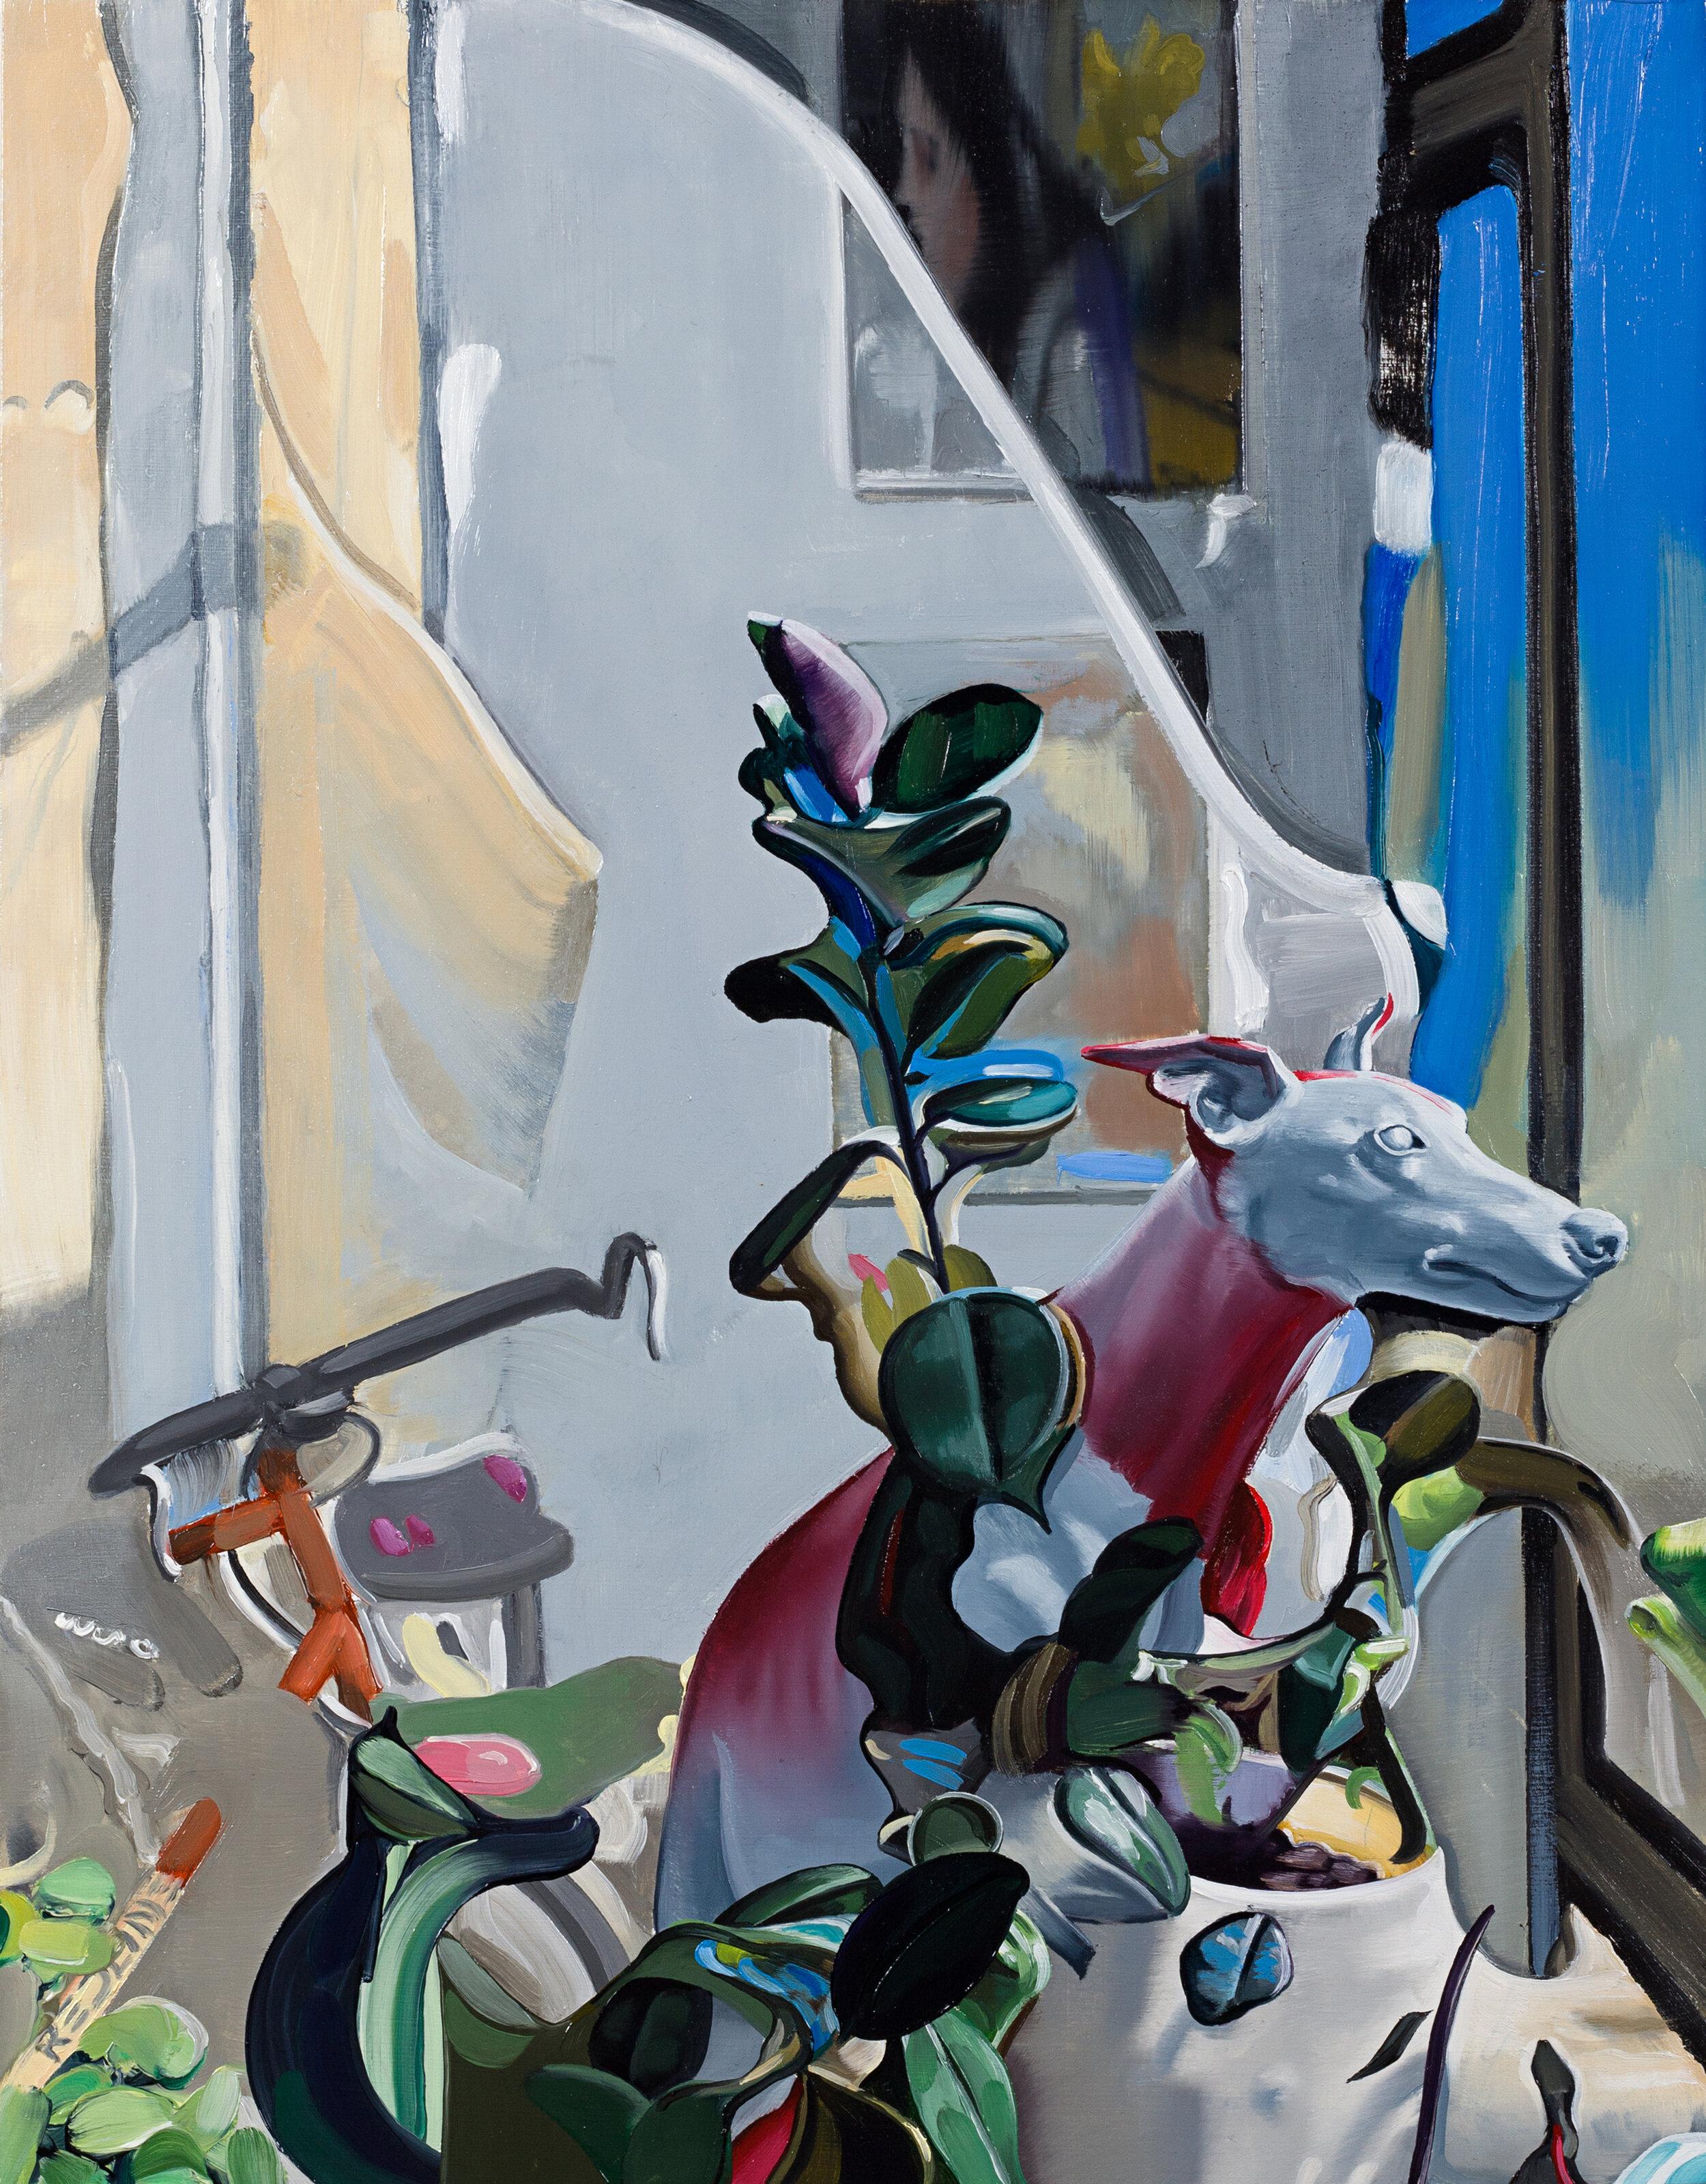 Studio II,  2019. Oil on panel, 14 x 11 inches